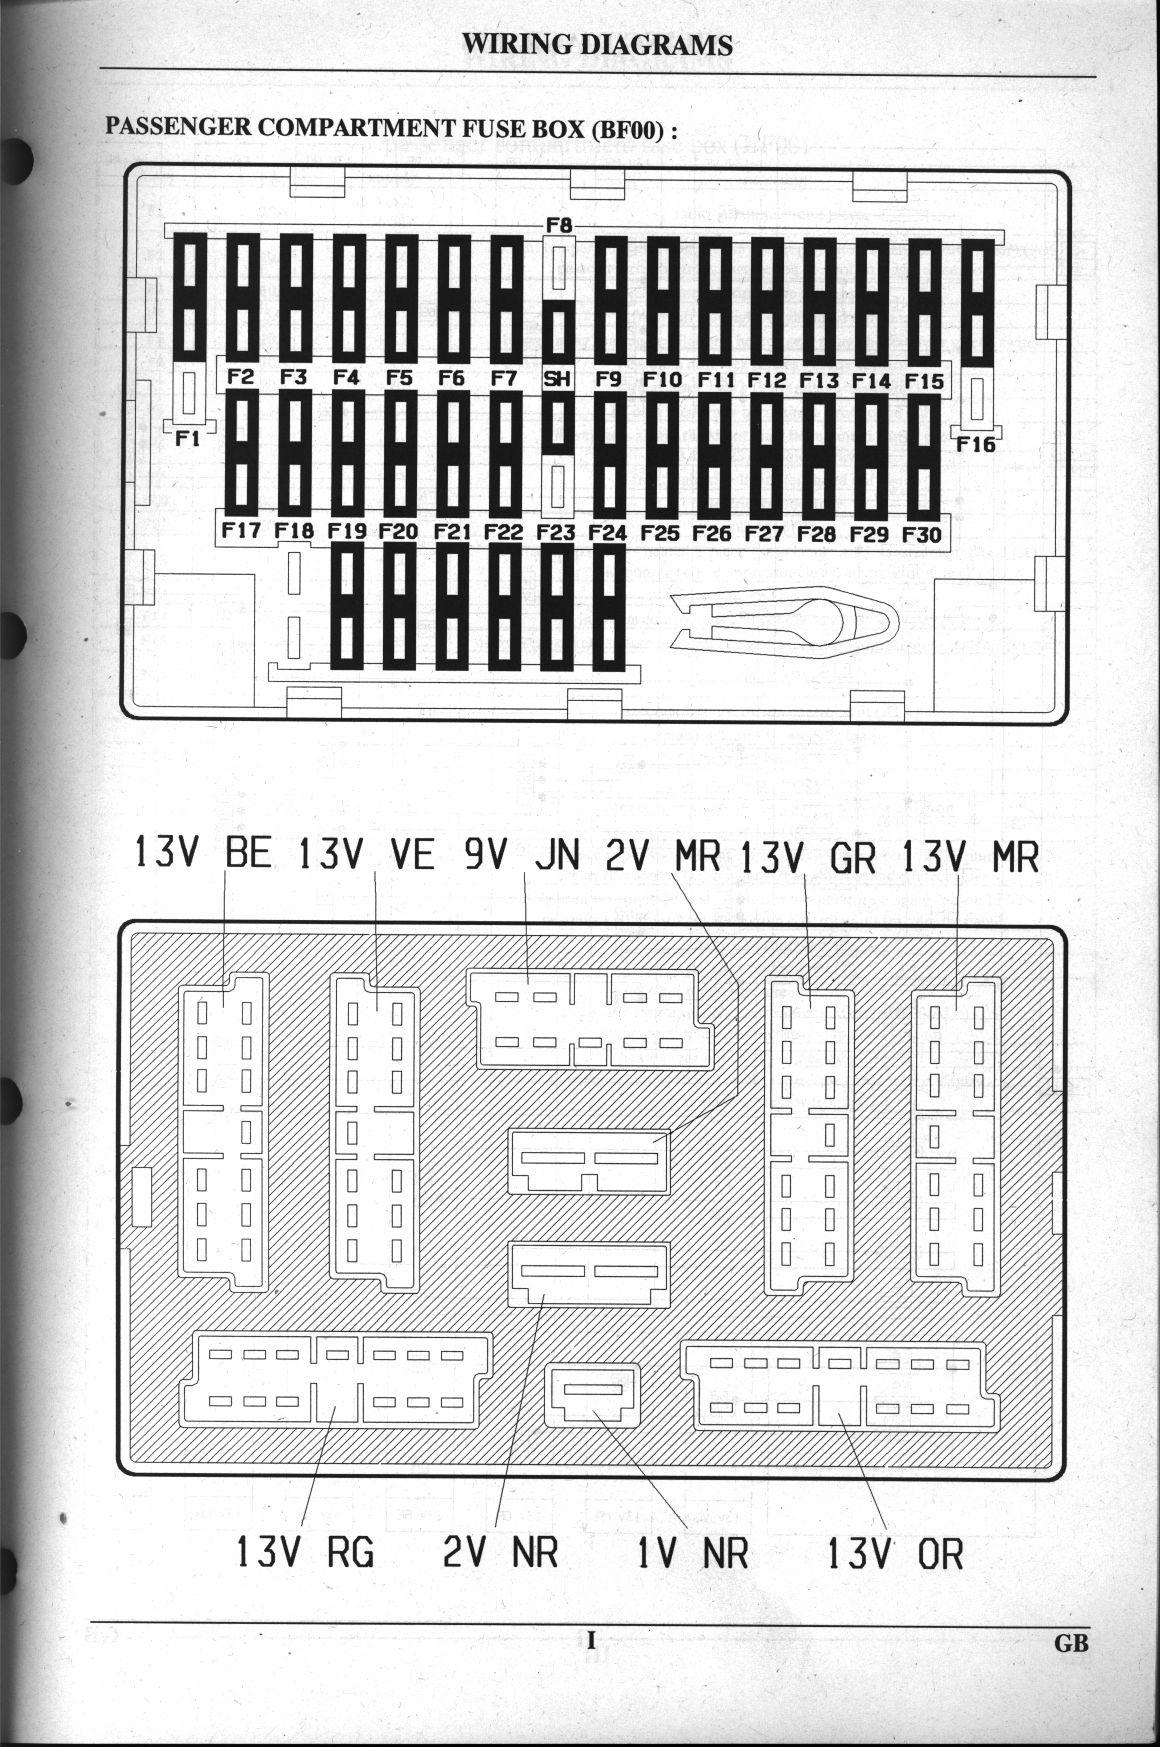 citroen nemo van fuse box wiring diagram Citroen Nemo MPV citroen nemo fuse box diagram wiring diagramscitroen fuse box layout wiring diagramscitroen fuse box layout